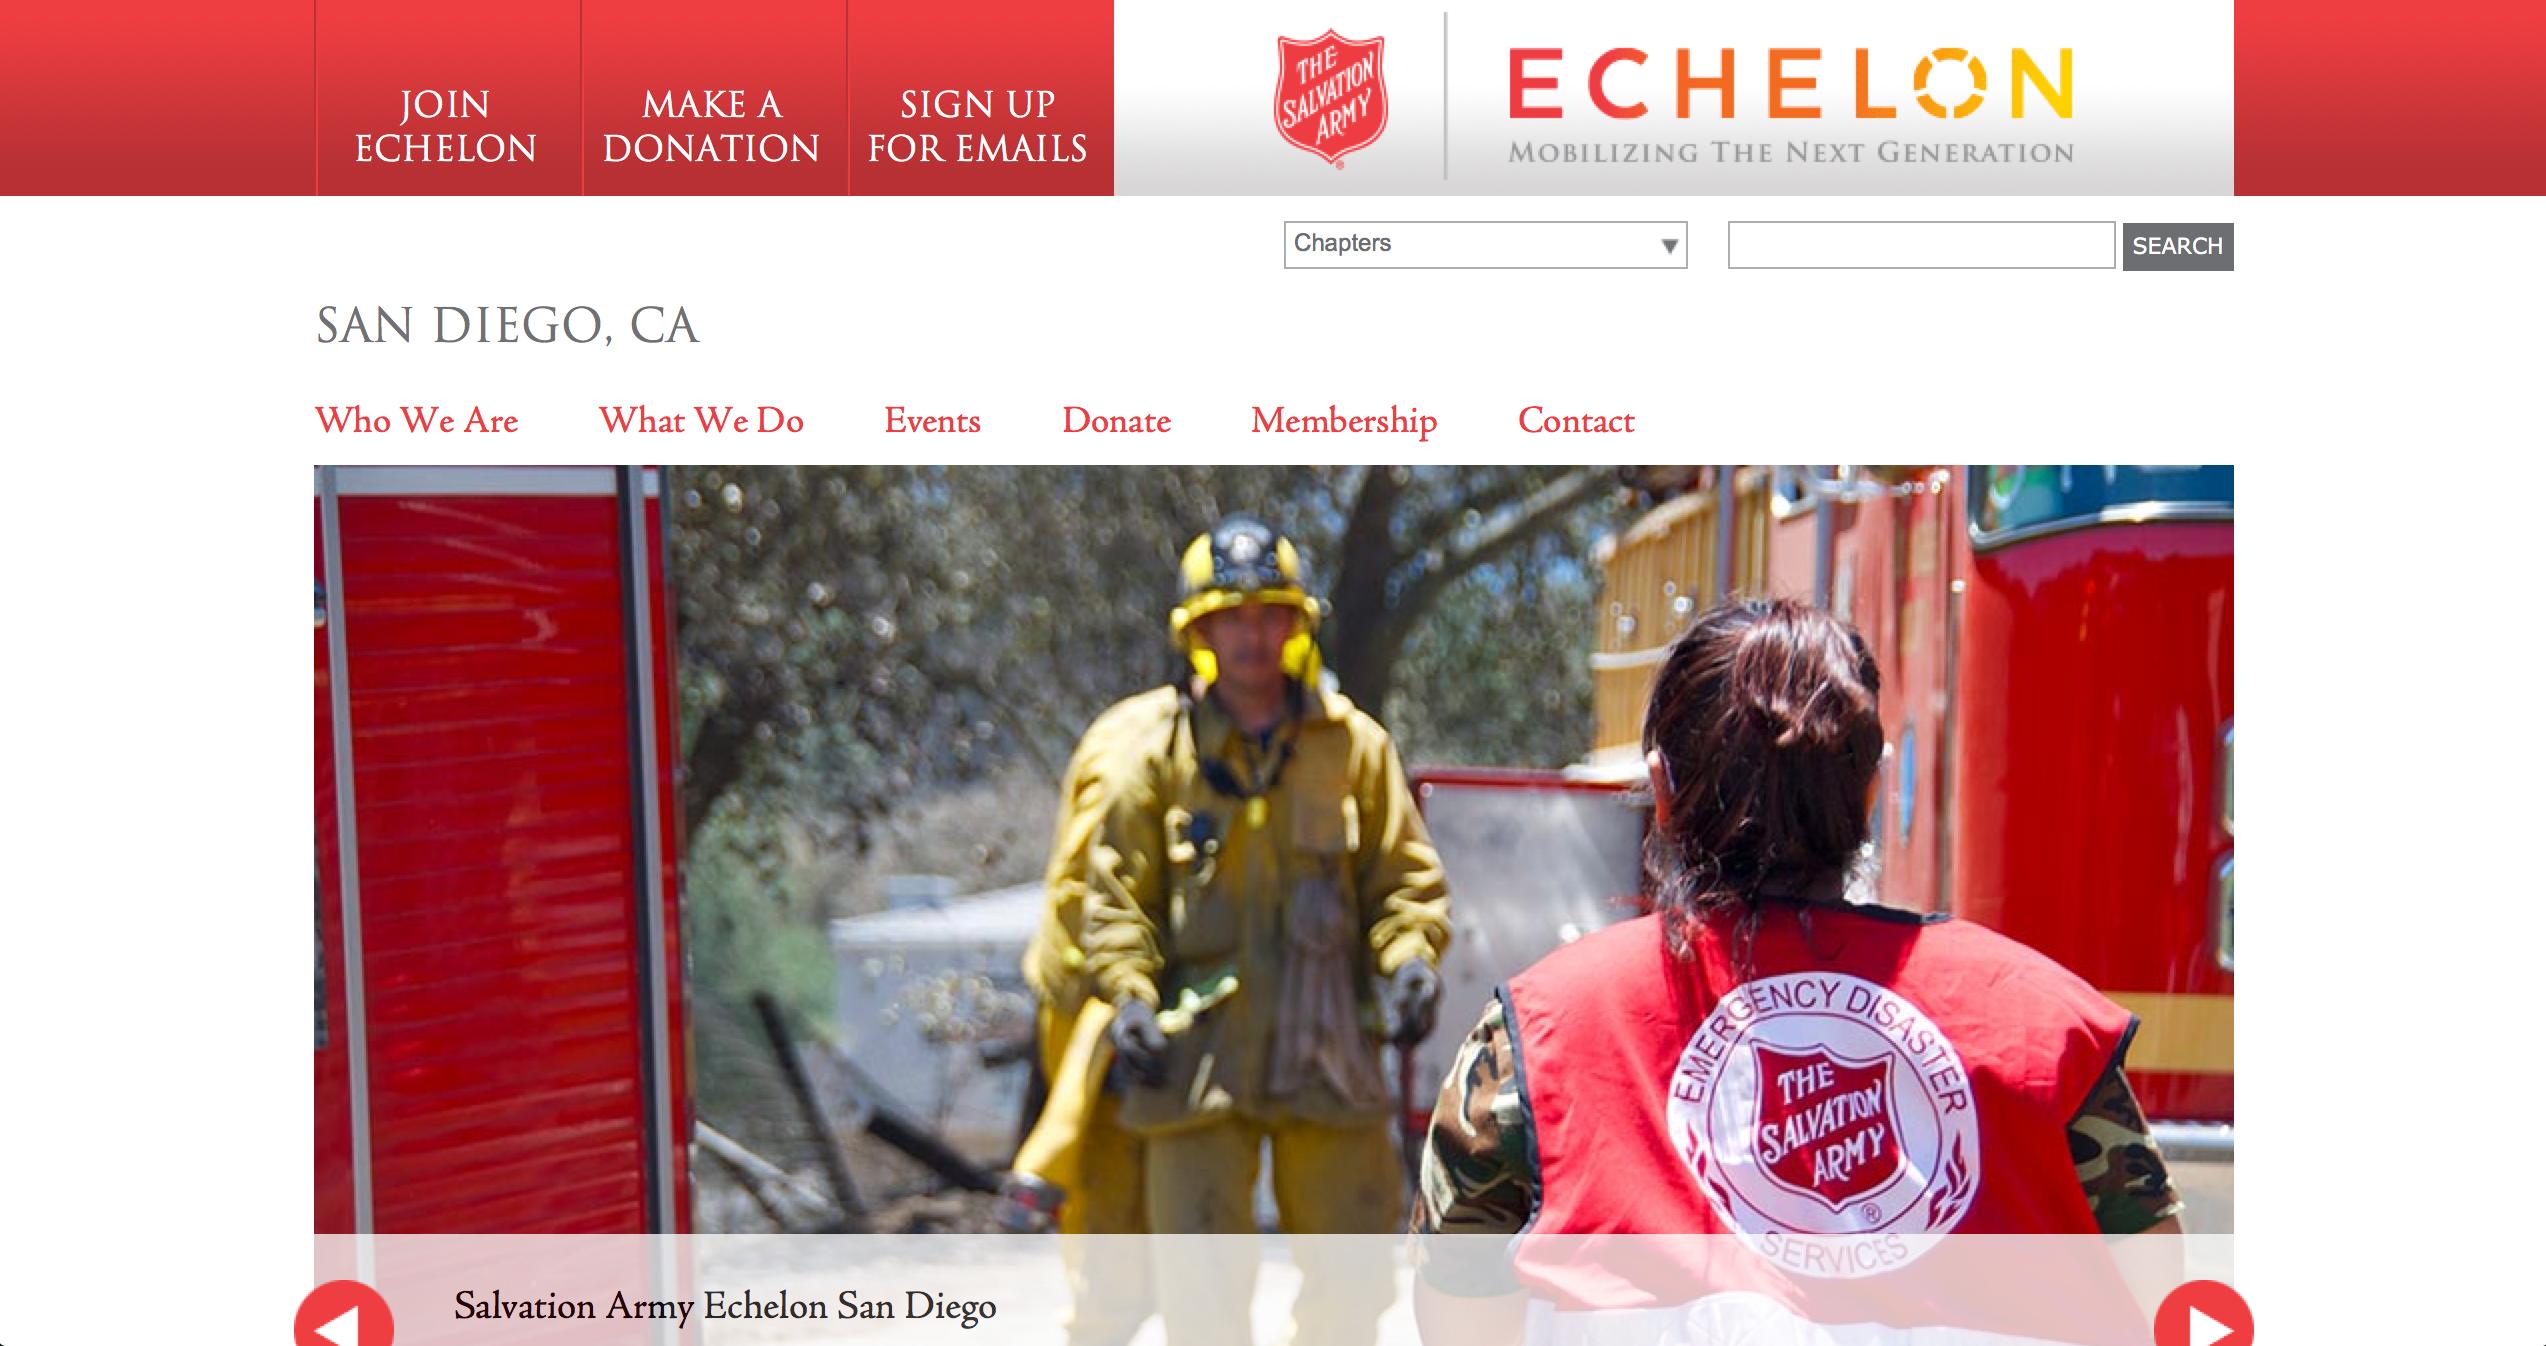 Salvation Army Echelon San Diego